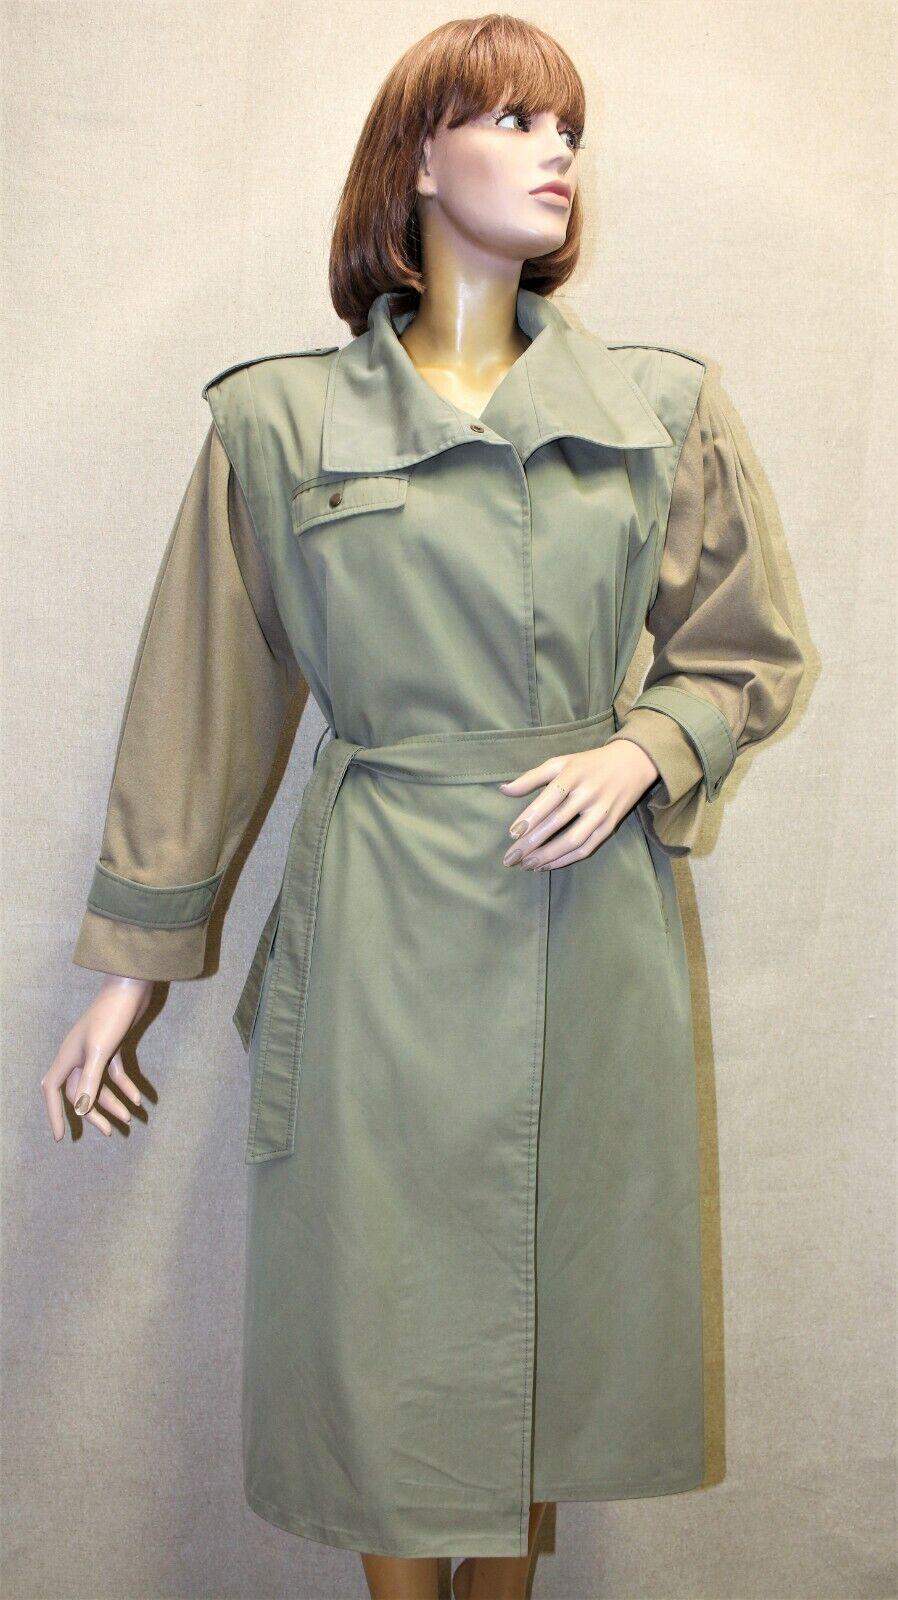 Trench imperméable femme manches laine burberry's vintage 80's kaki taille 42 fr